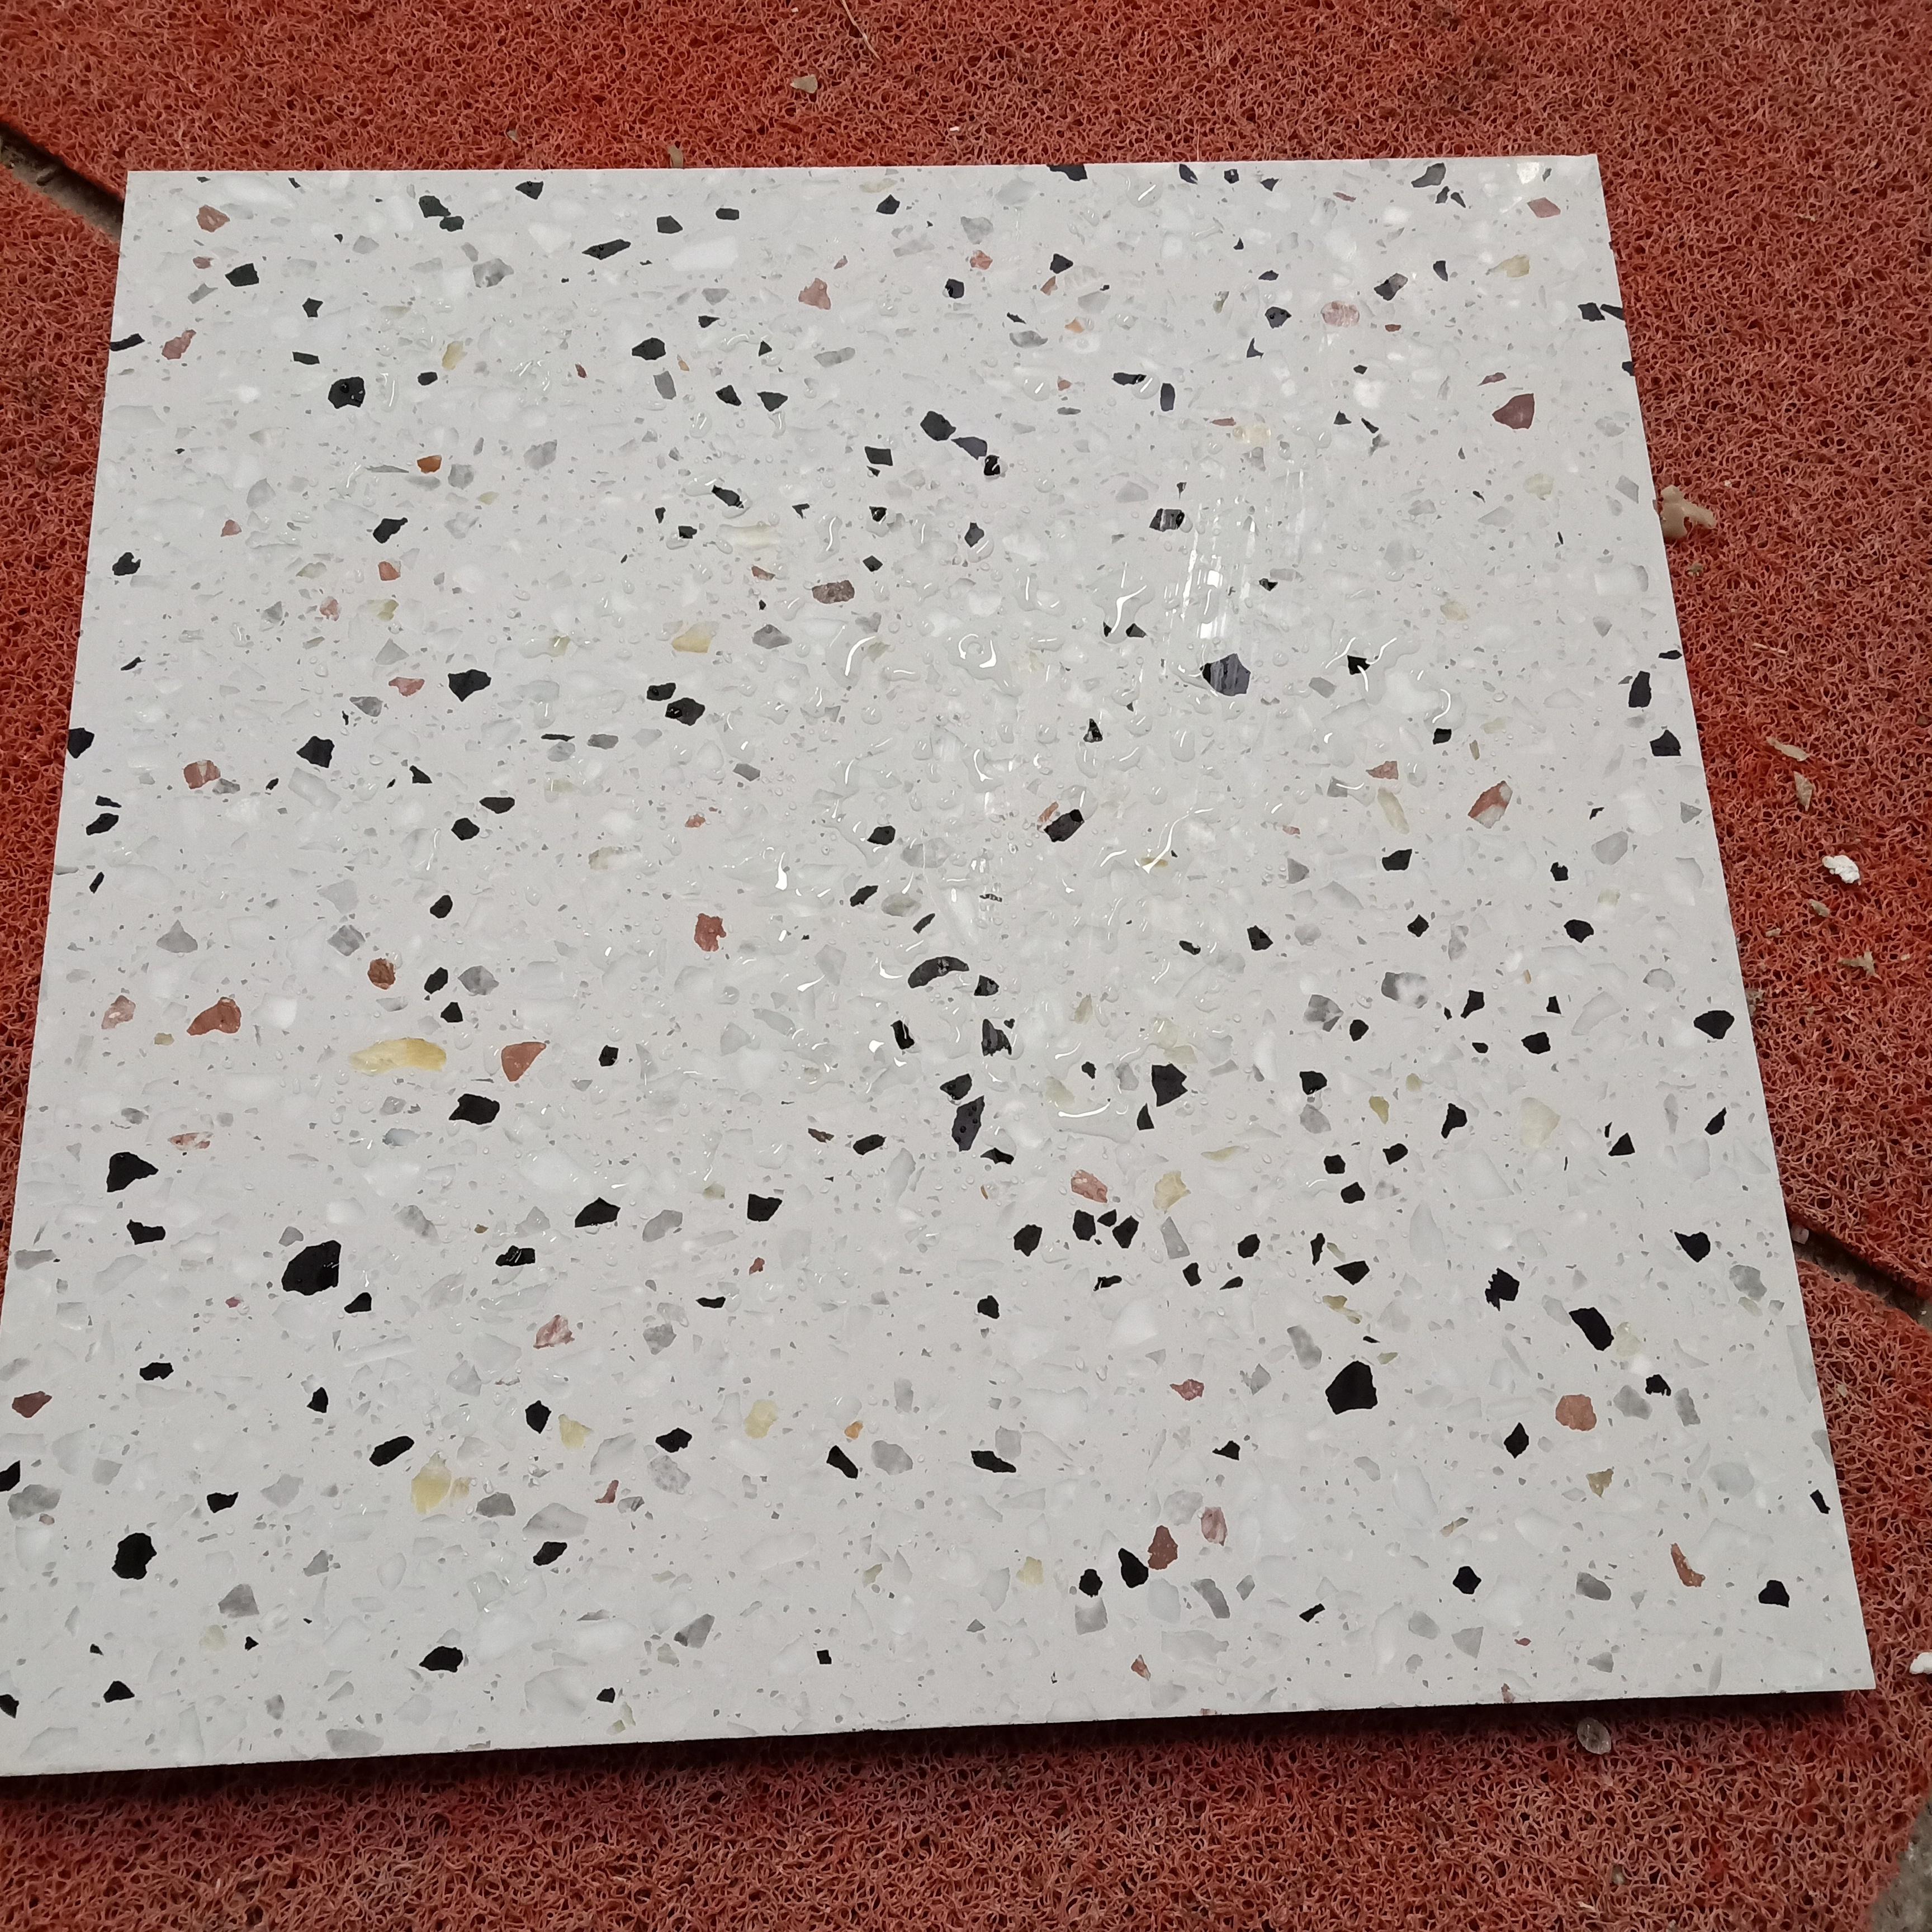 Hot Sale Flooring Tiles No Epoxy Terrazzo Buy Epoxy Terrazzo Terrazzo Terrazzo Flooring Product On Alibaba Com